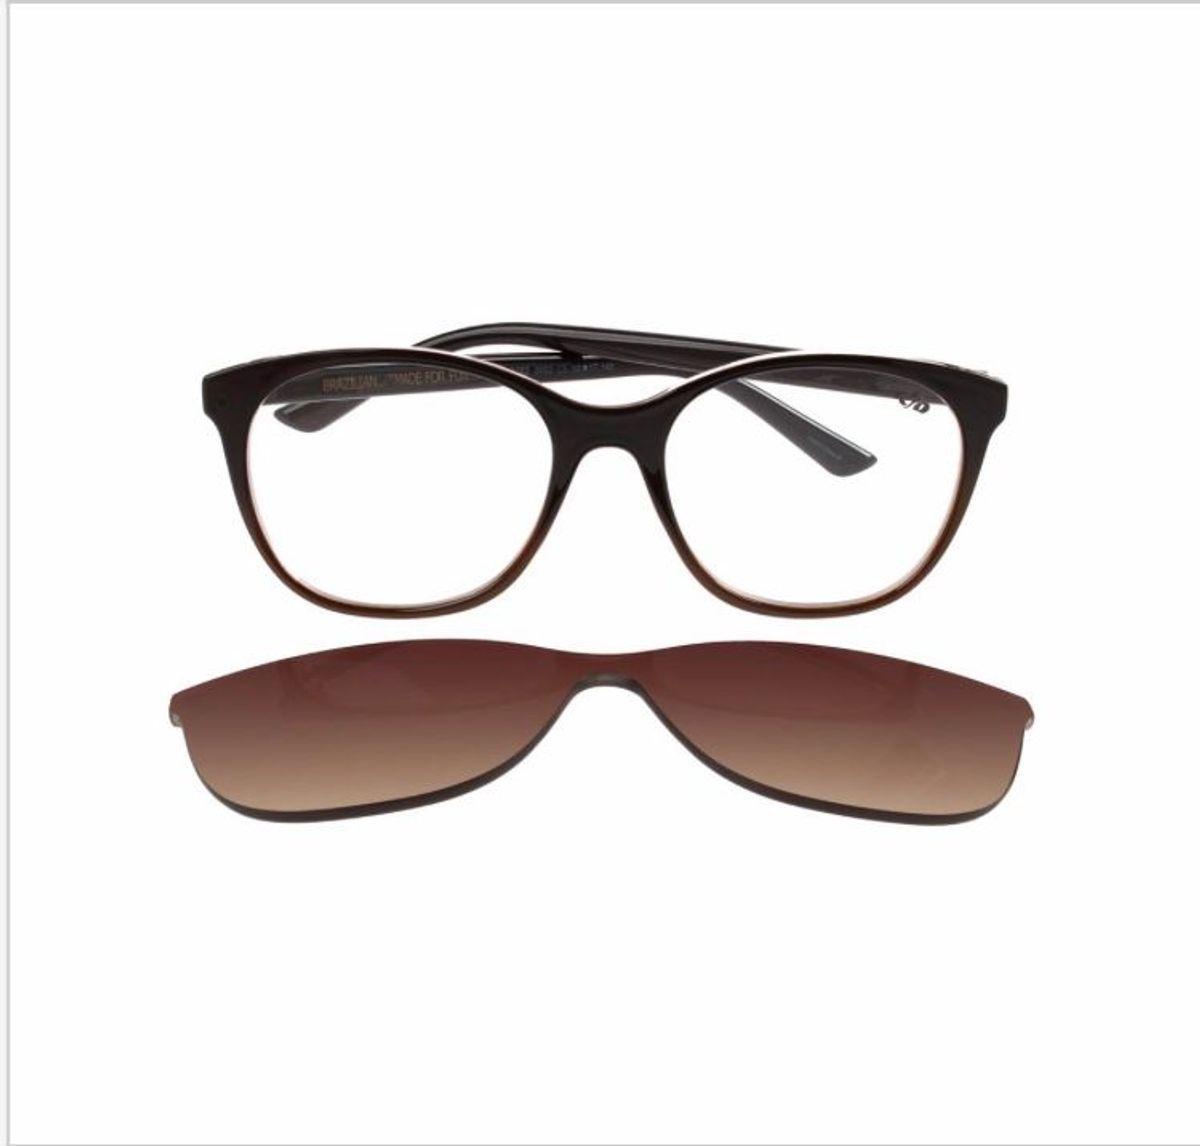 9b380d7d9 óculos sol grau - óculos chilli-beans.  Czm6ly9wag90b3muzw5qb2vplmnvbs5ici9wcm9kdwn0cy8zmji2ntqvzgjimda2yte3yjuwotflnju1ogyynmm1ogyymdbkztmuanbn